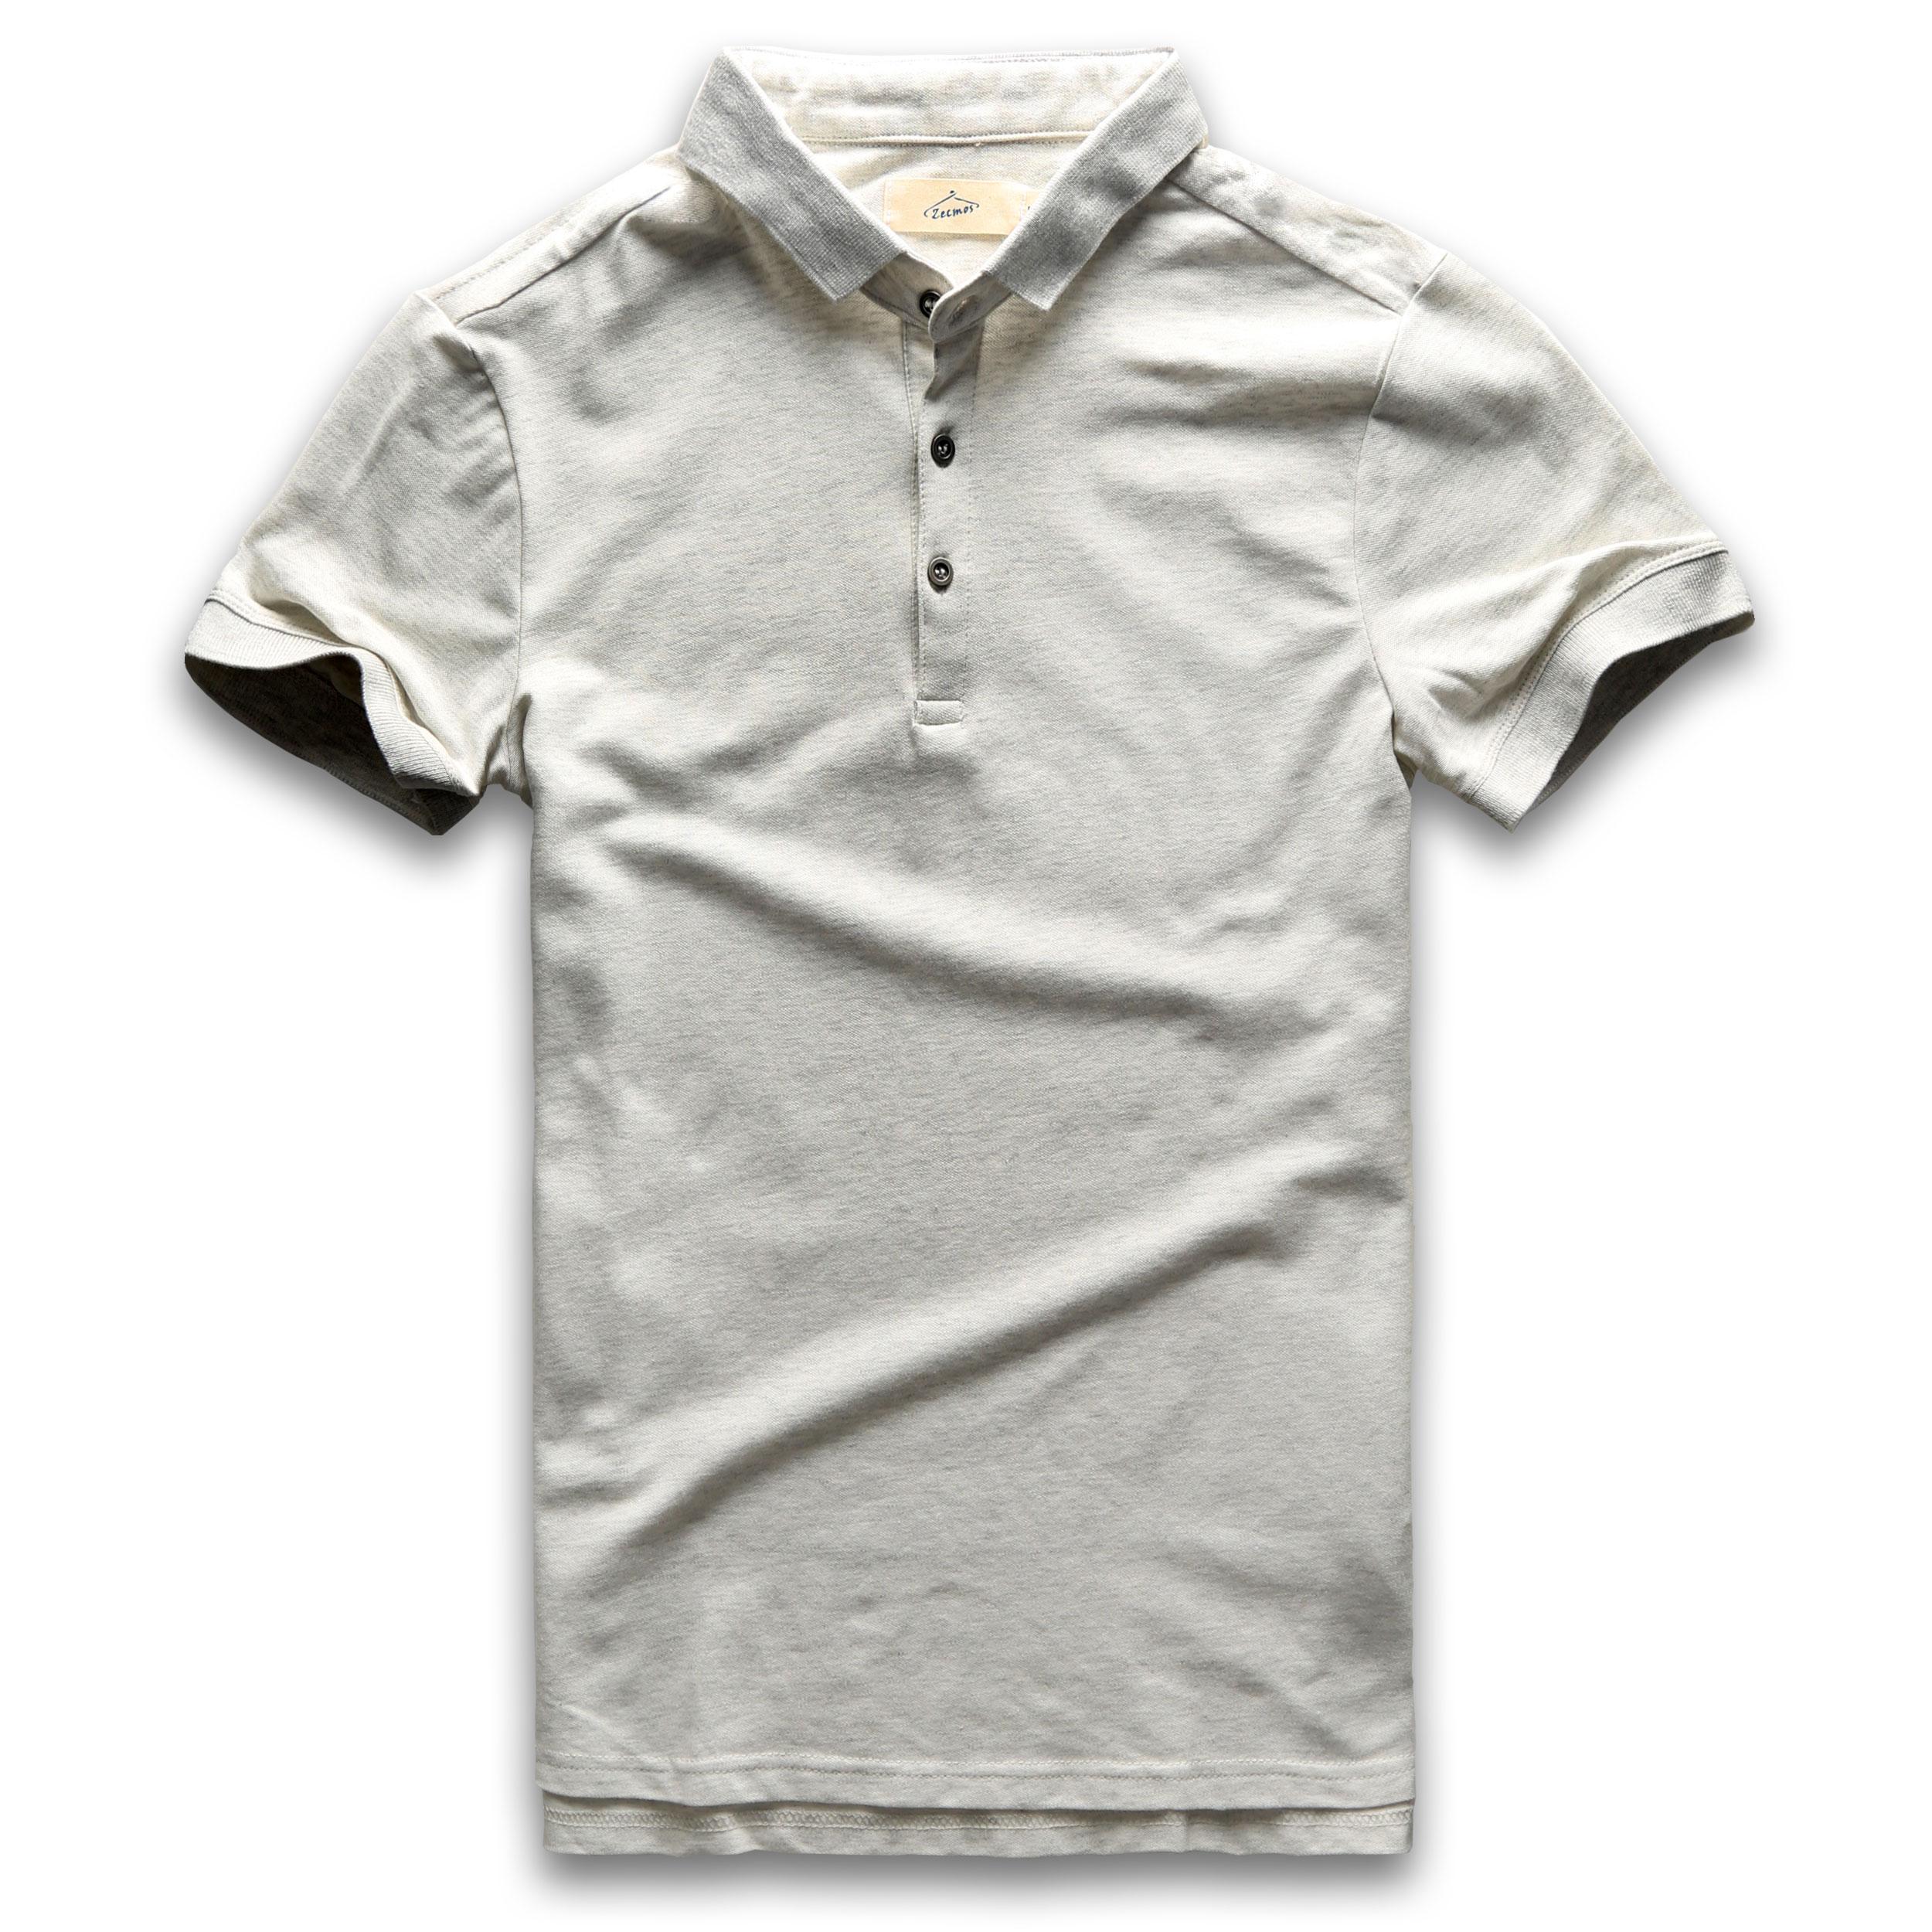 M XL L Mens Polo Shirts Random Lot of 7 Short Sleeve Cotton Casual S